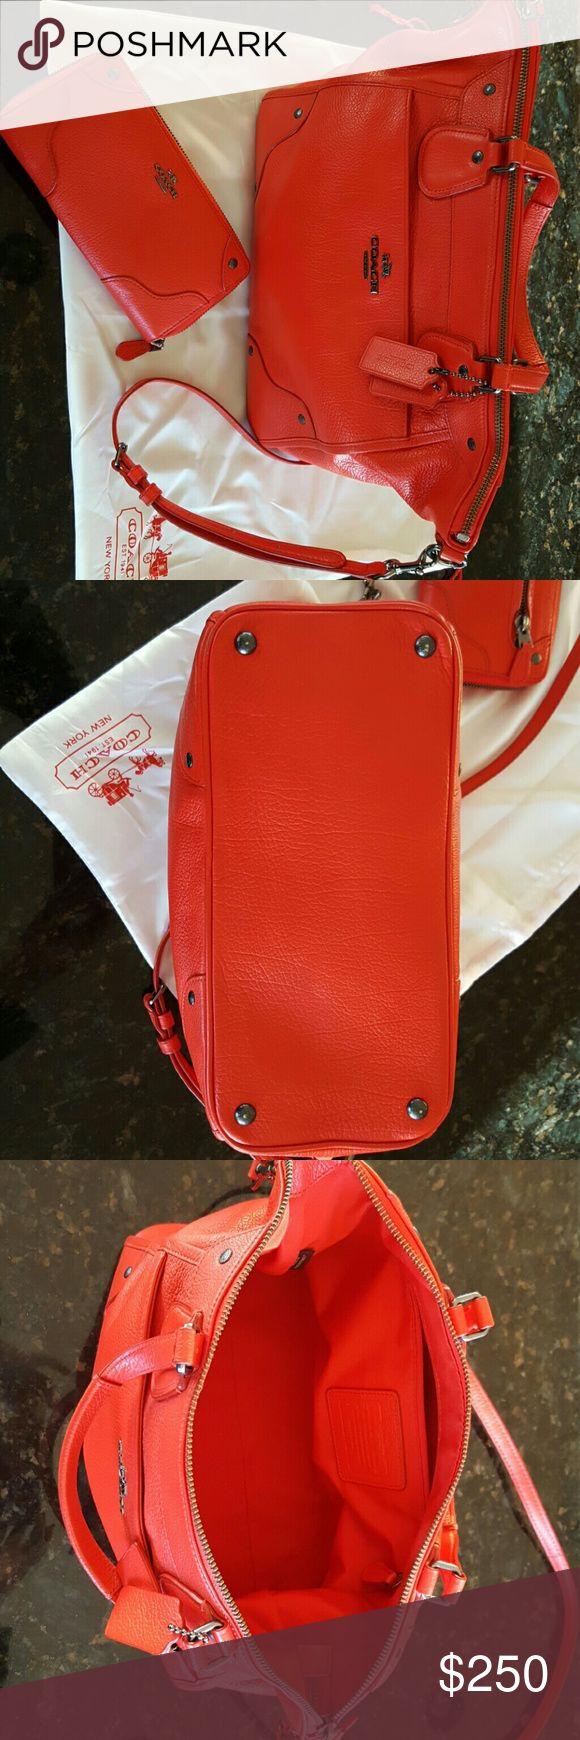 Authentic COACH Handbag with Wallet Soft Leather, Orange Coach Bags